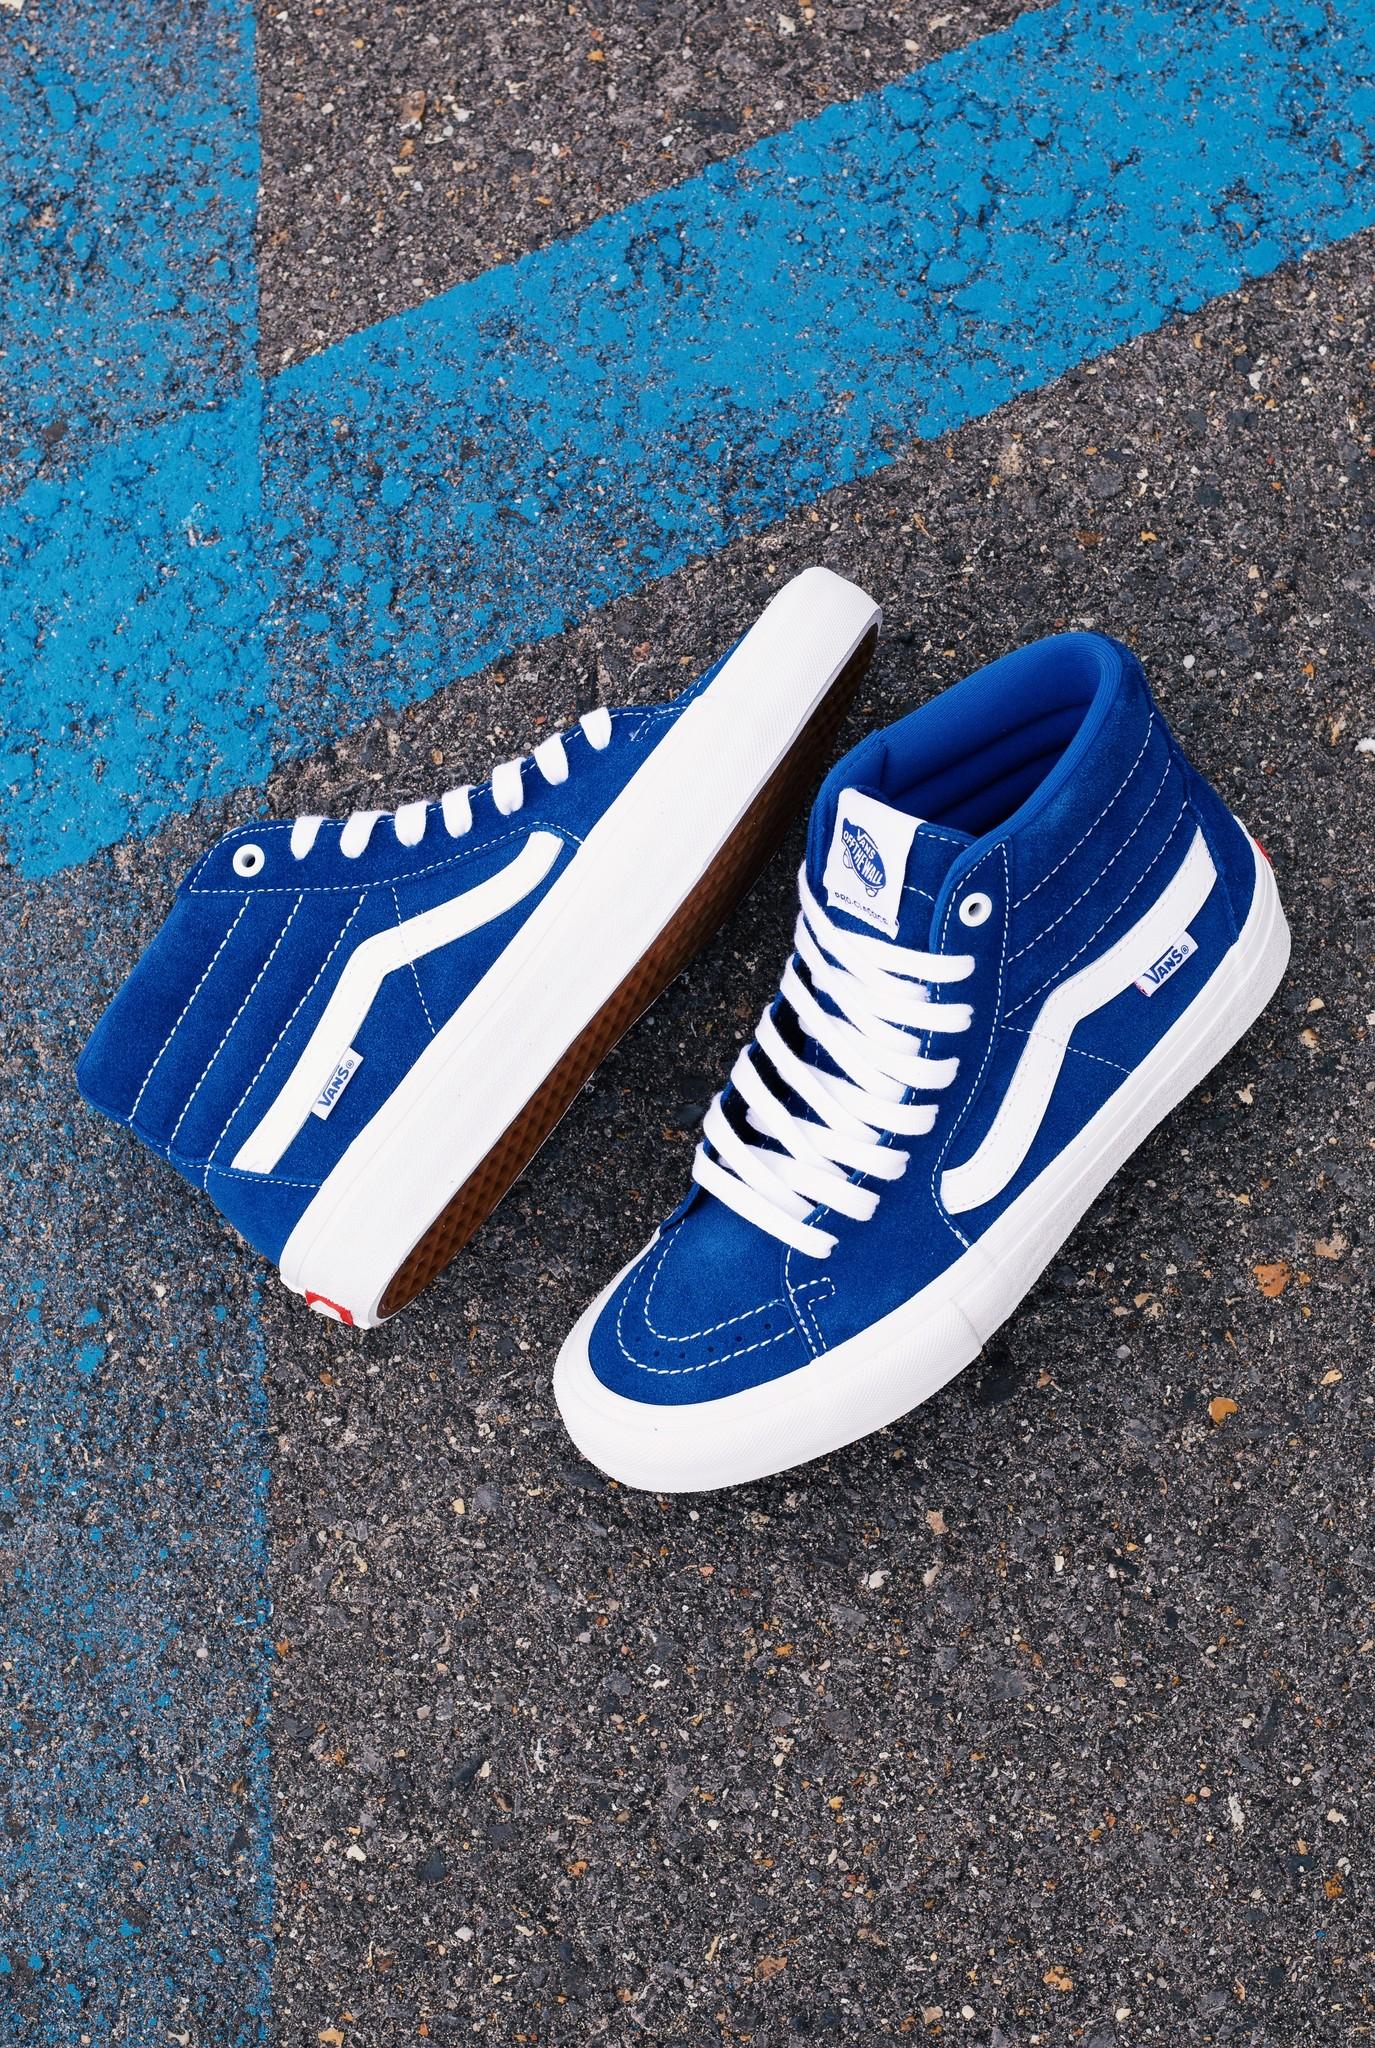 Vans Sk8 Hi Pro true blue/white